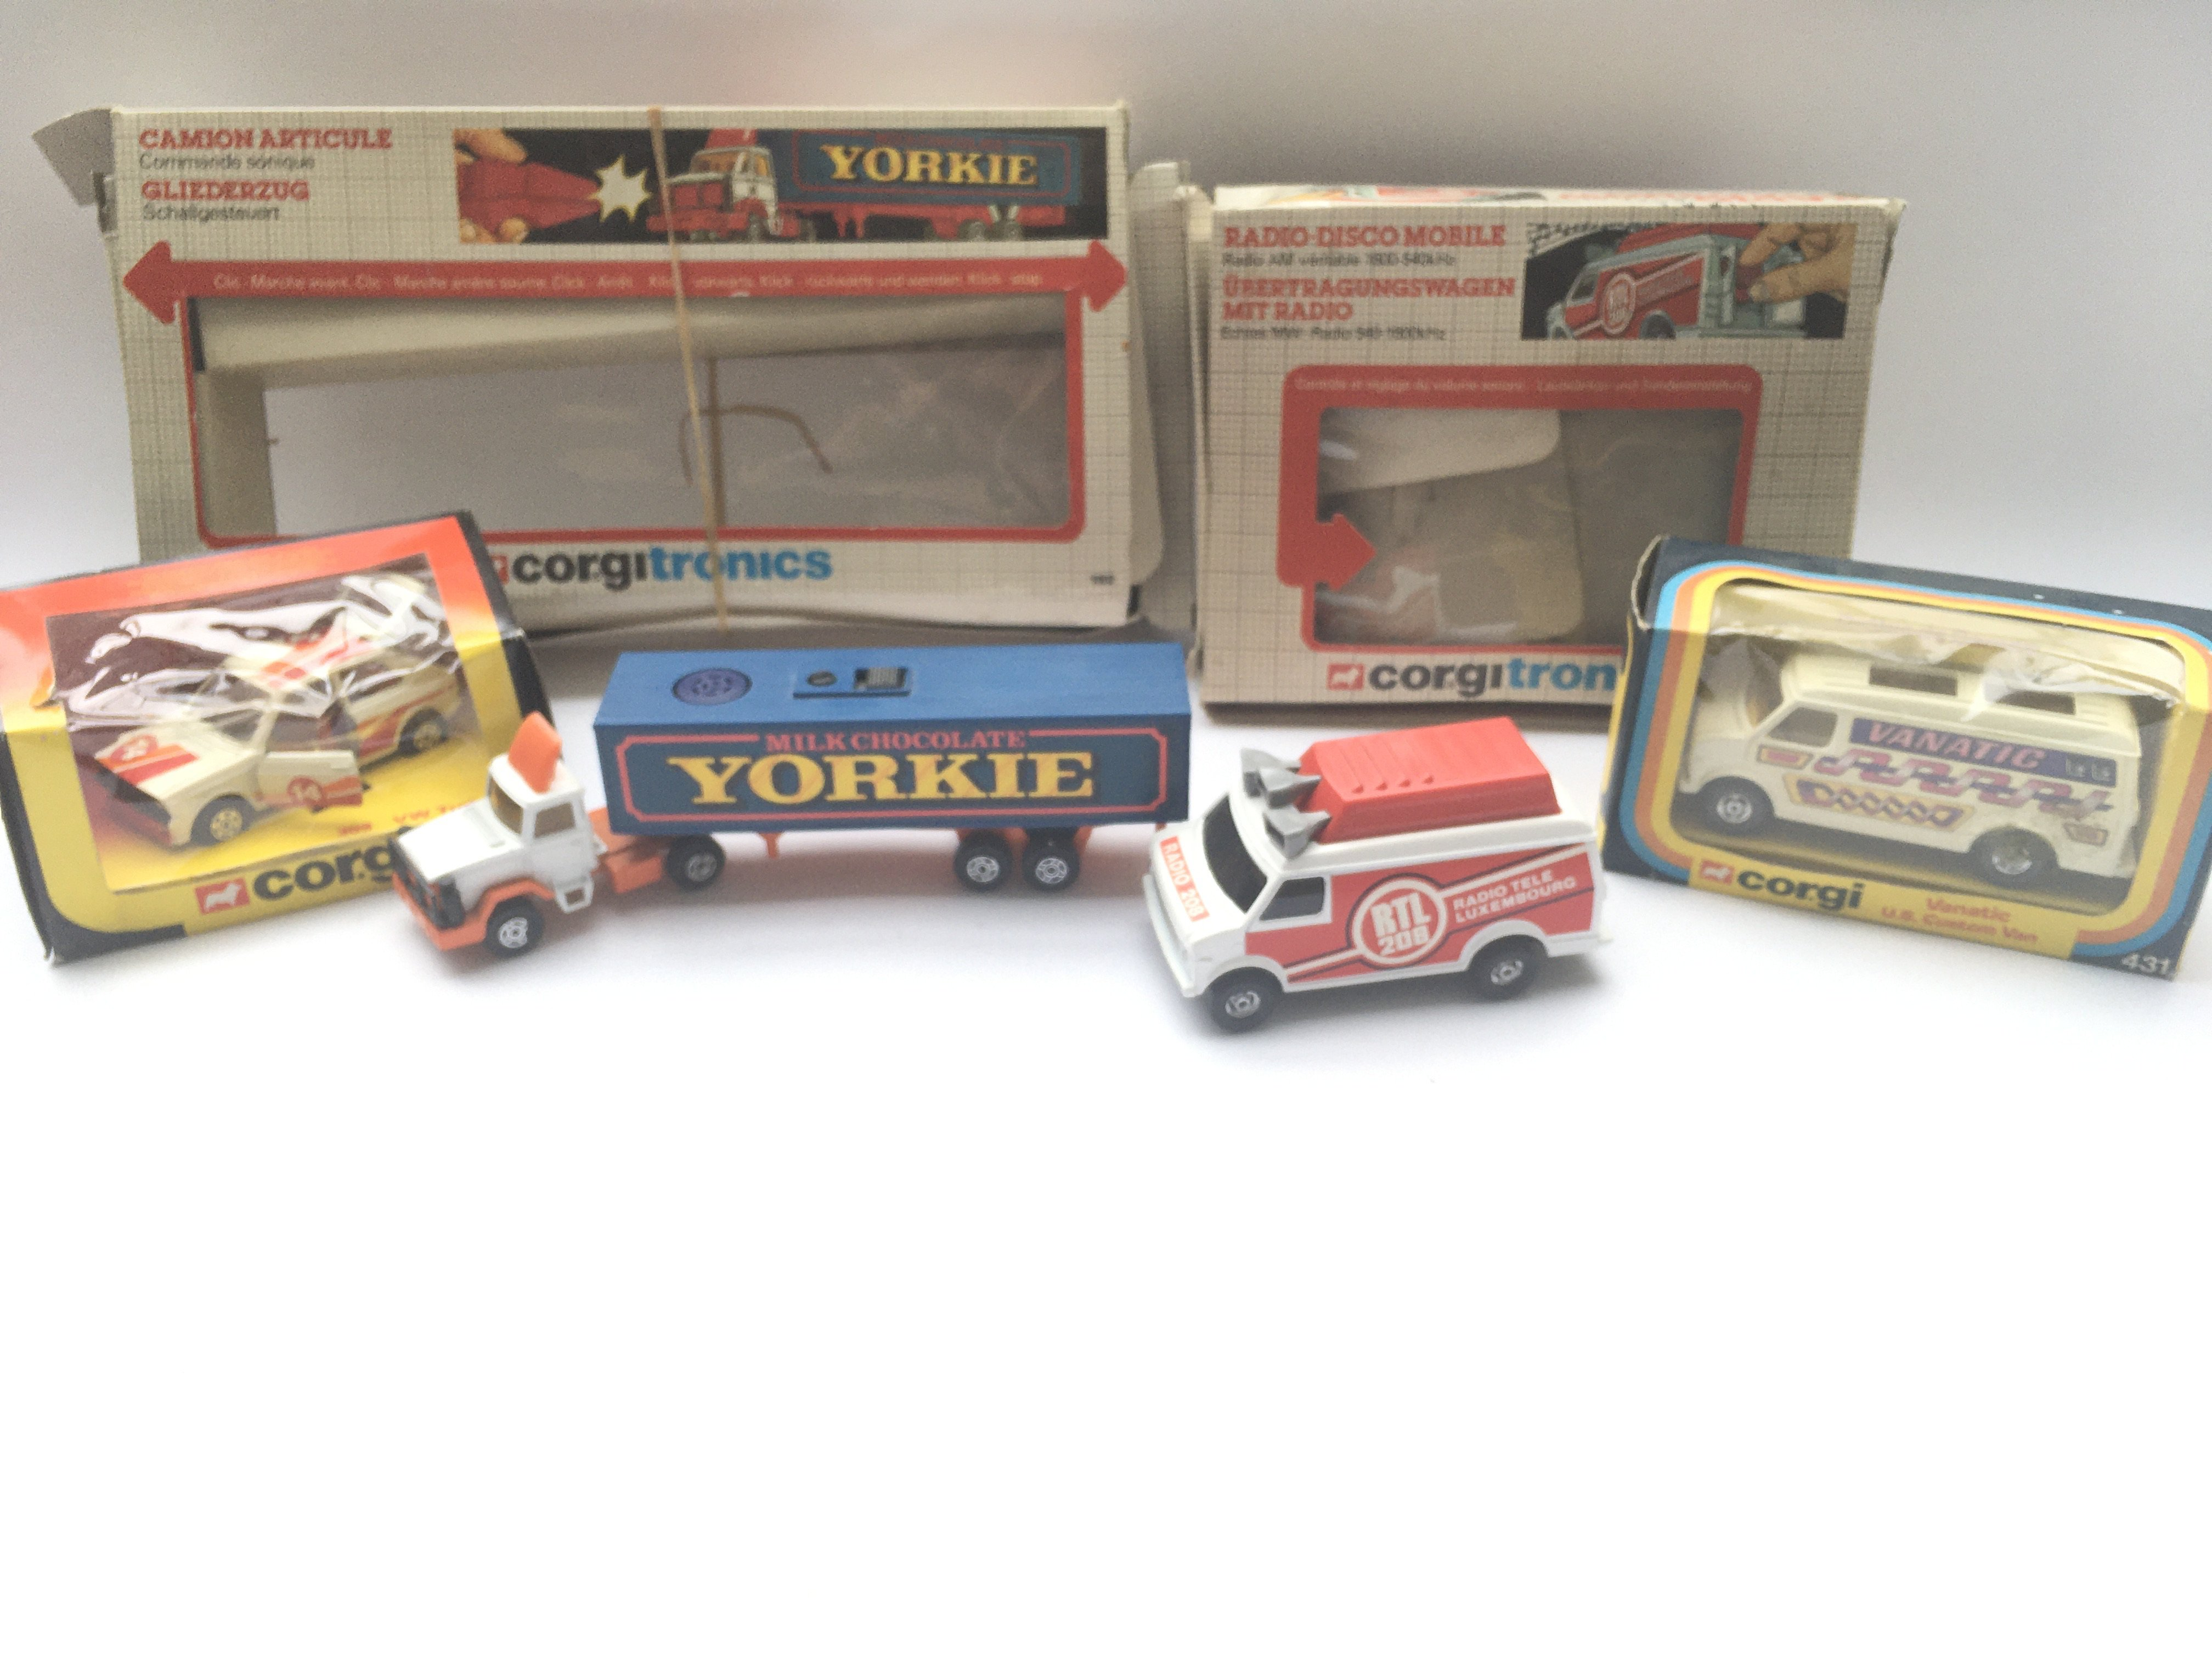 2 x Corgitronic Vehicles #1002 (control missing) a